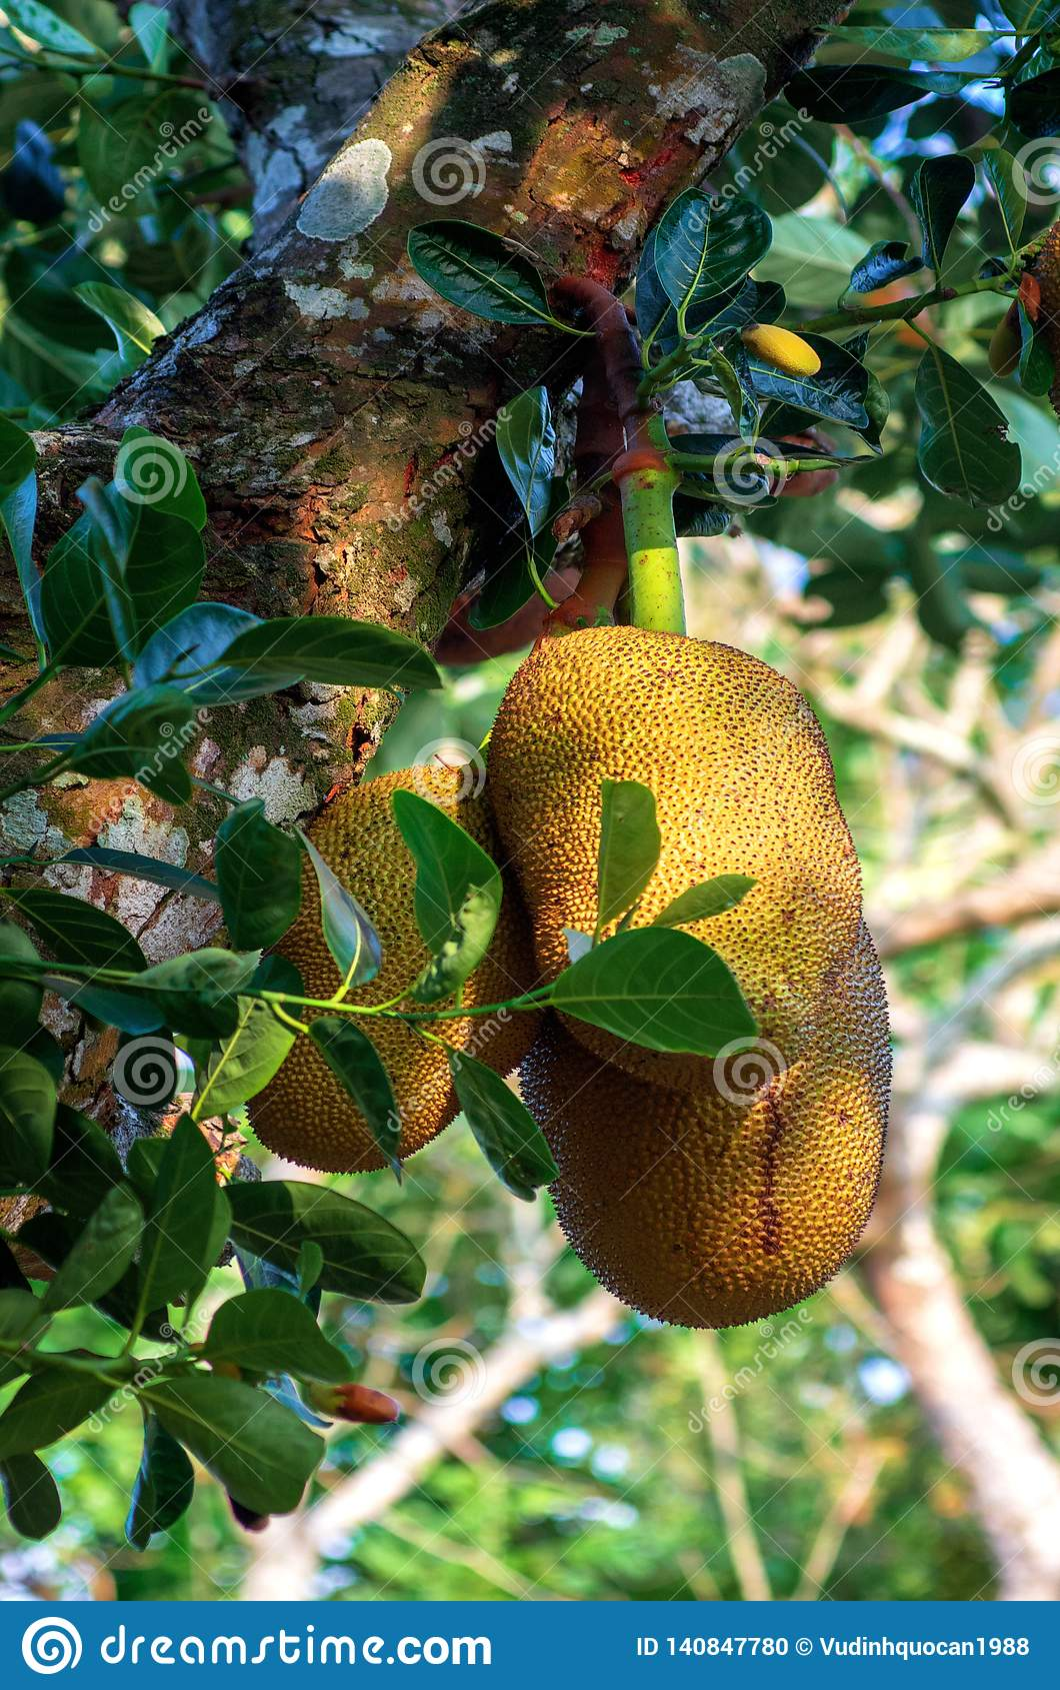 jackfruit from childhood to maturity